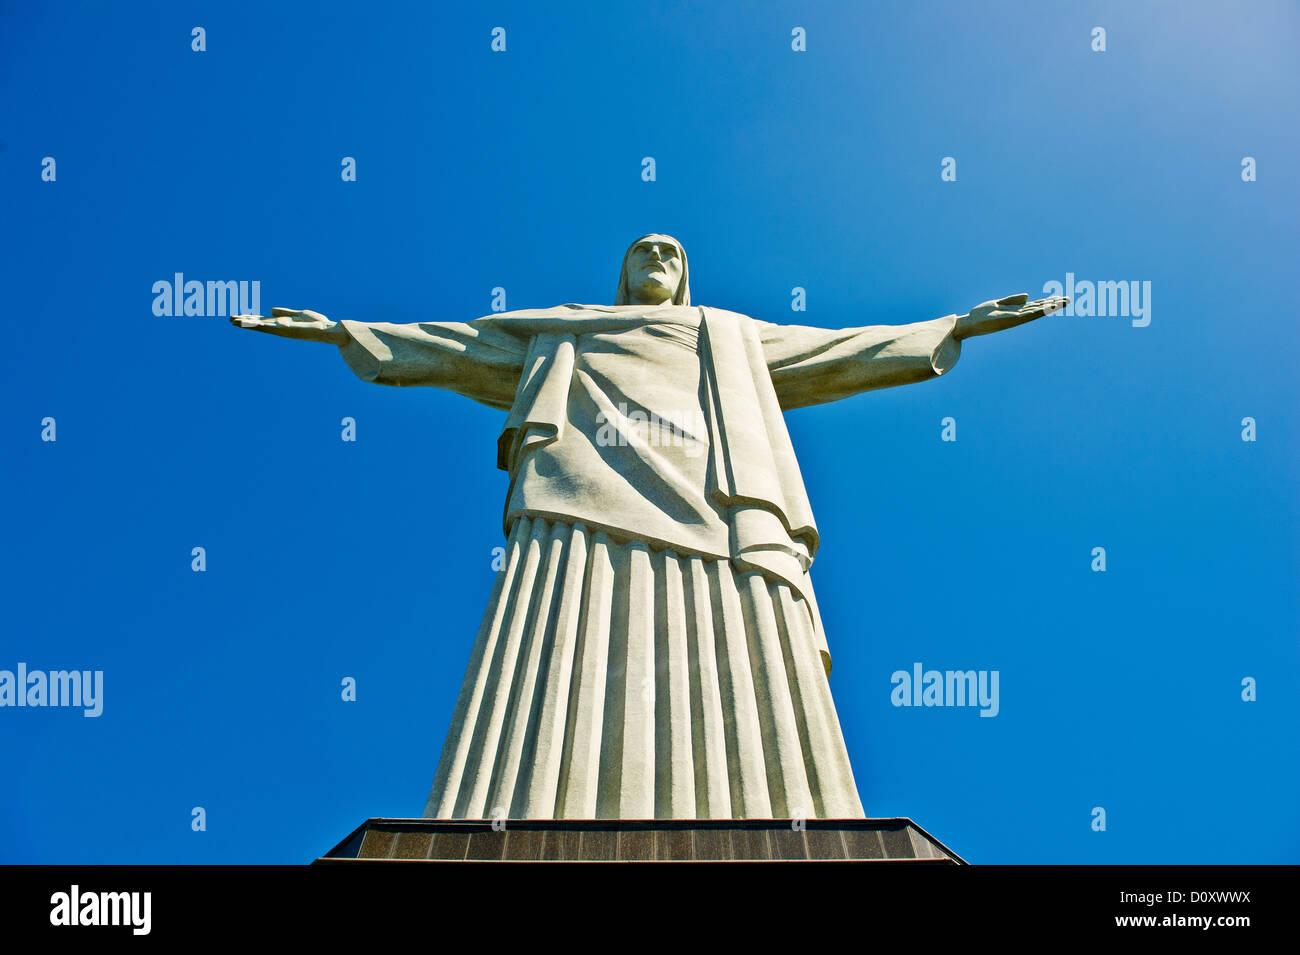 Christ the Redeemer Statue, Rio de Janeiro, Brazil - Stock Image